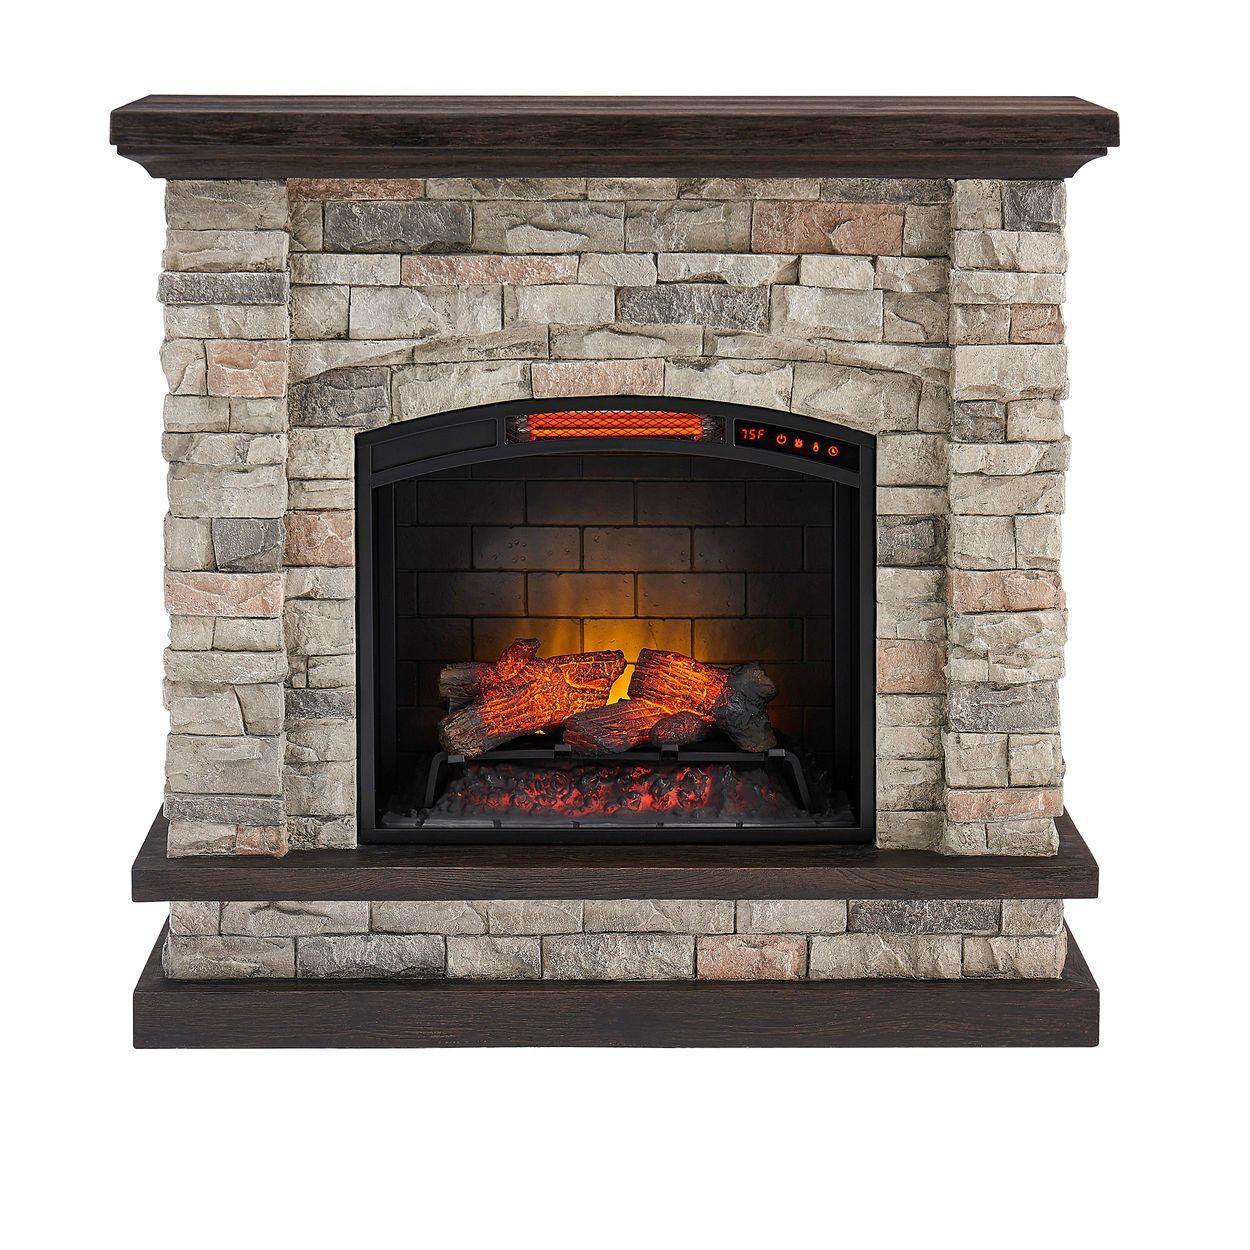 Allen Roth 43 5 In W Faux Stone Infrared Quartz Electric Fireplace Lowes Com Fireplace Electric Fireplace Best Electric Fireplace